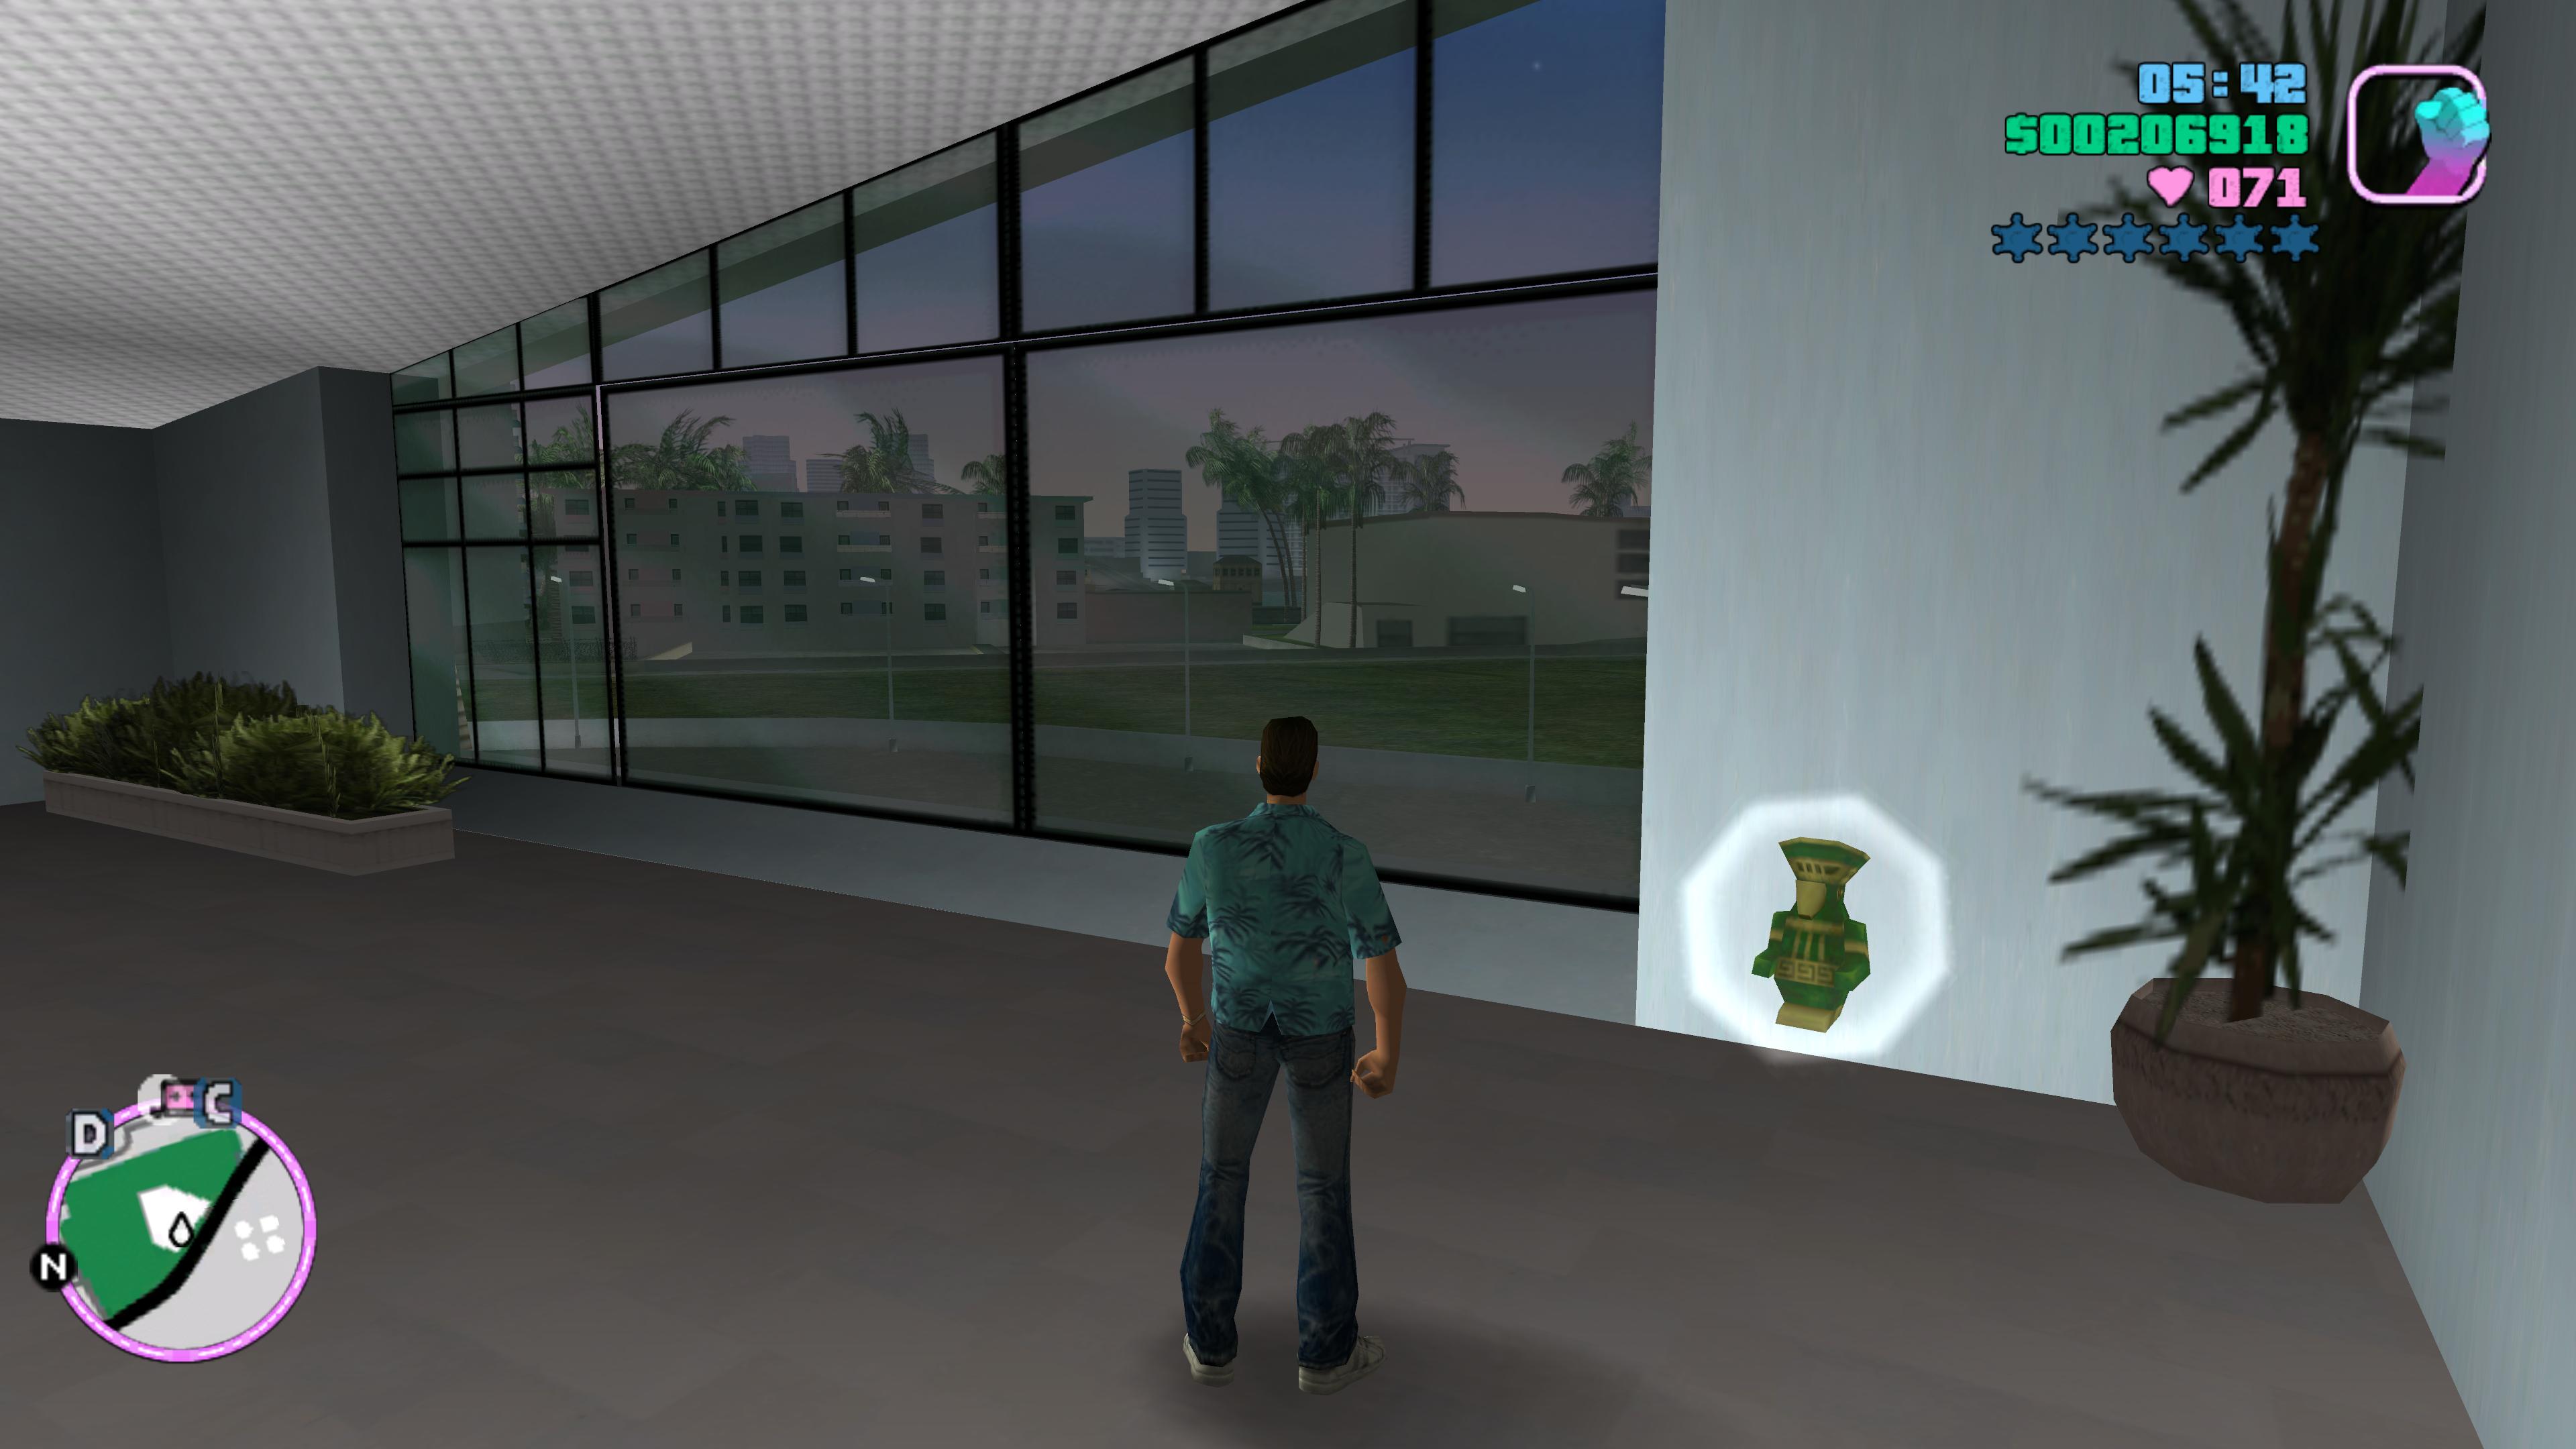 Archivo:GTA VC Objeto Oculto 78.PNG